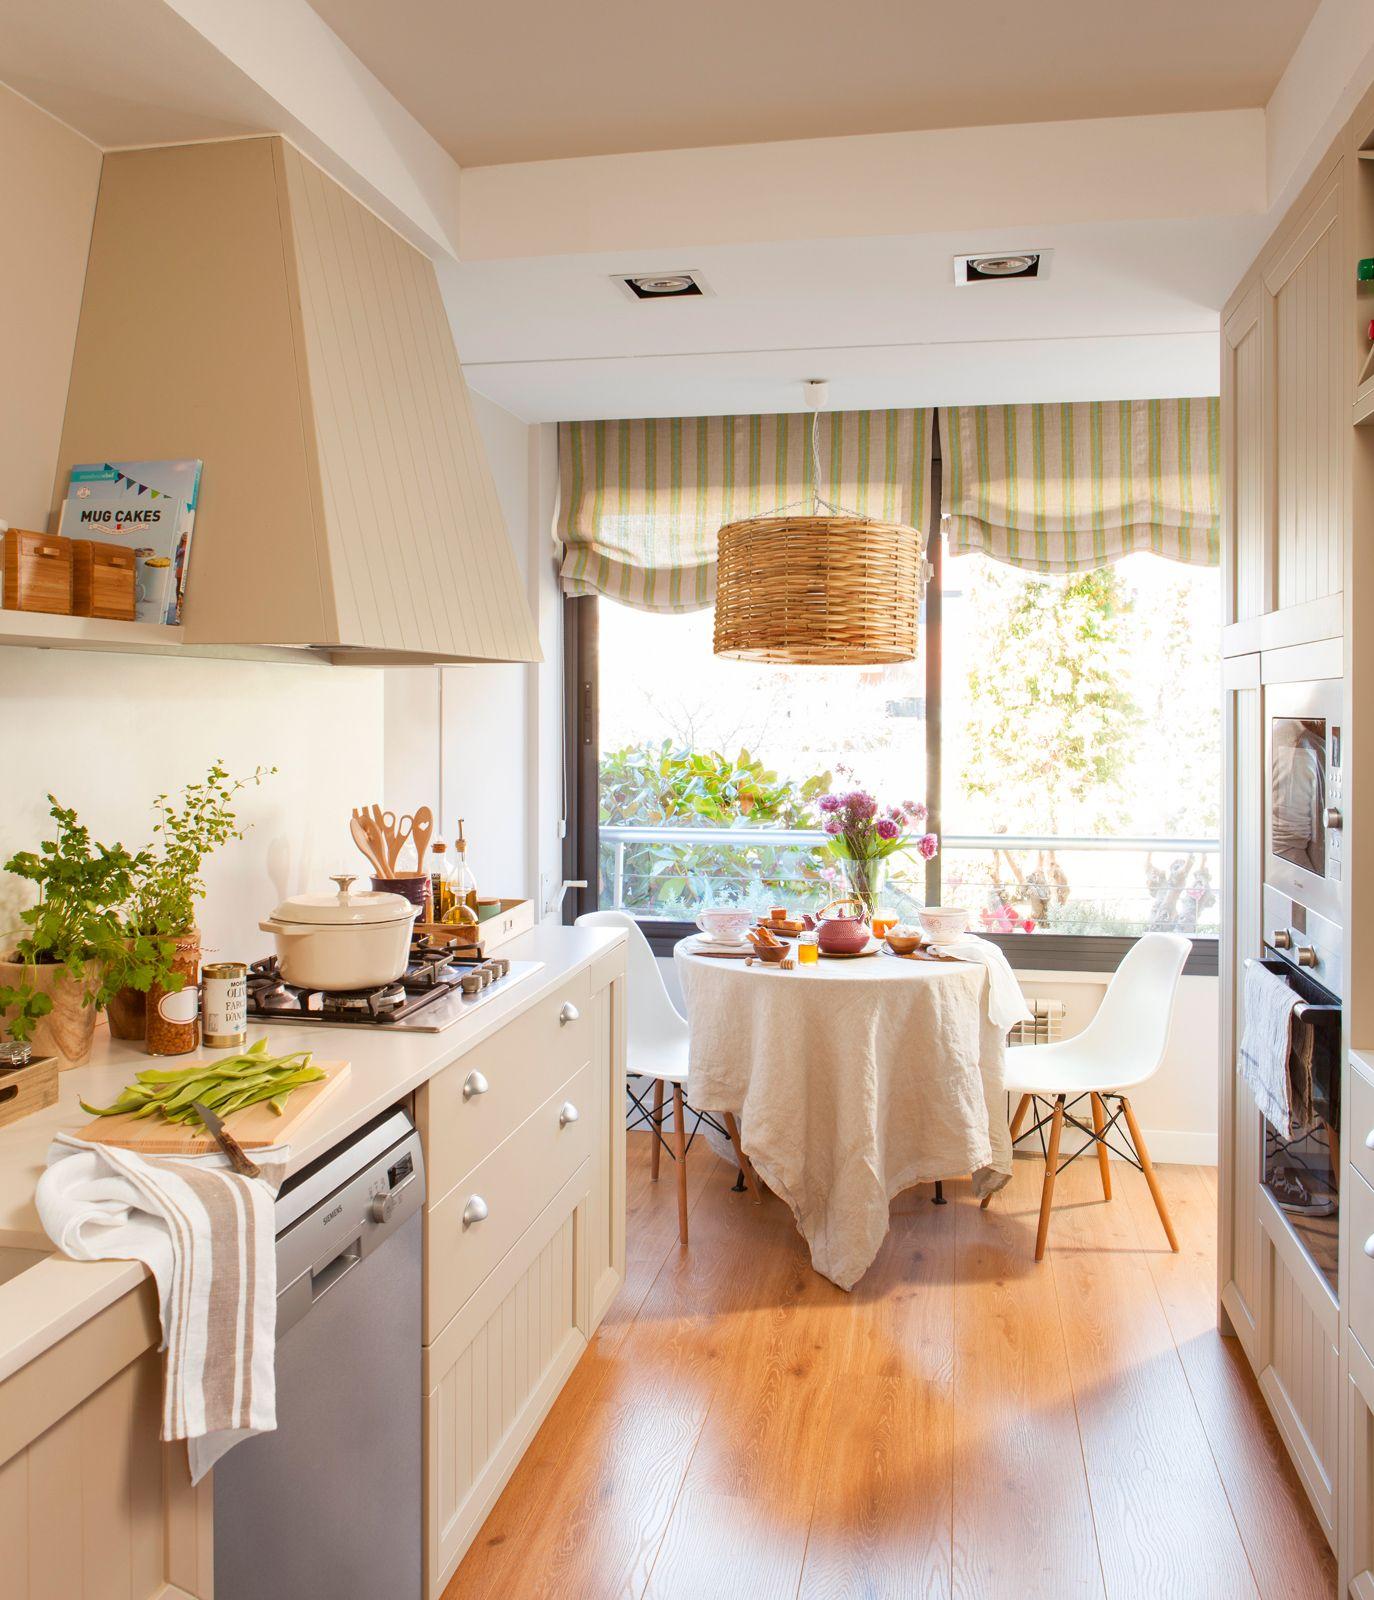 Cocina peque a con muebles panelados en madera office con for Decoracion de cocinas pequenas en madera